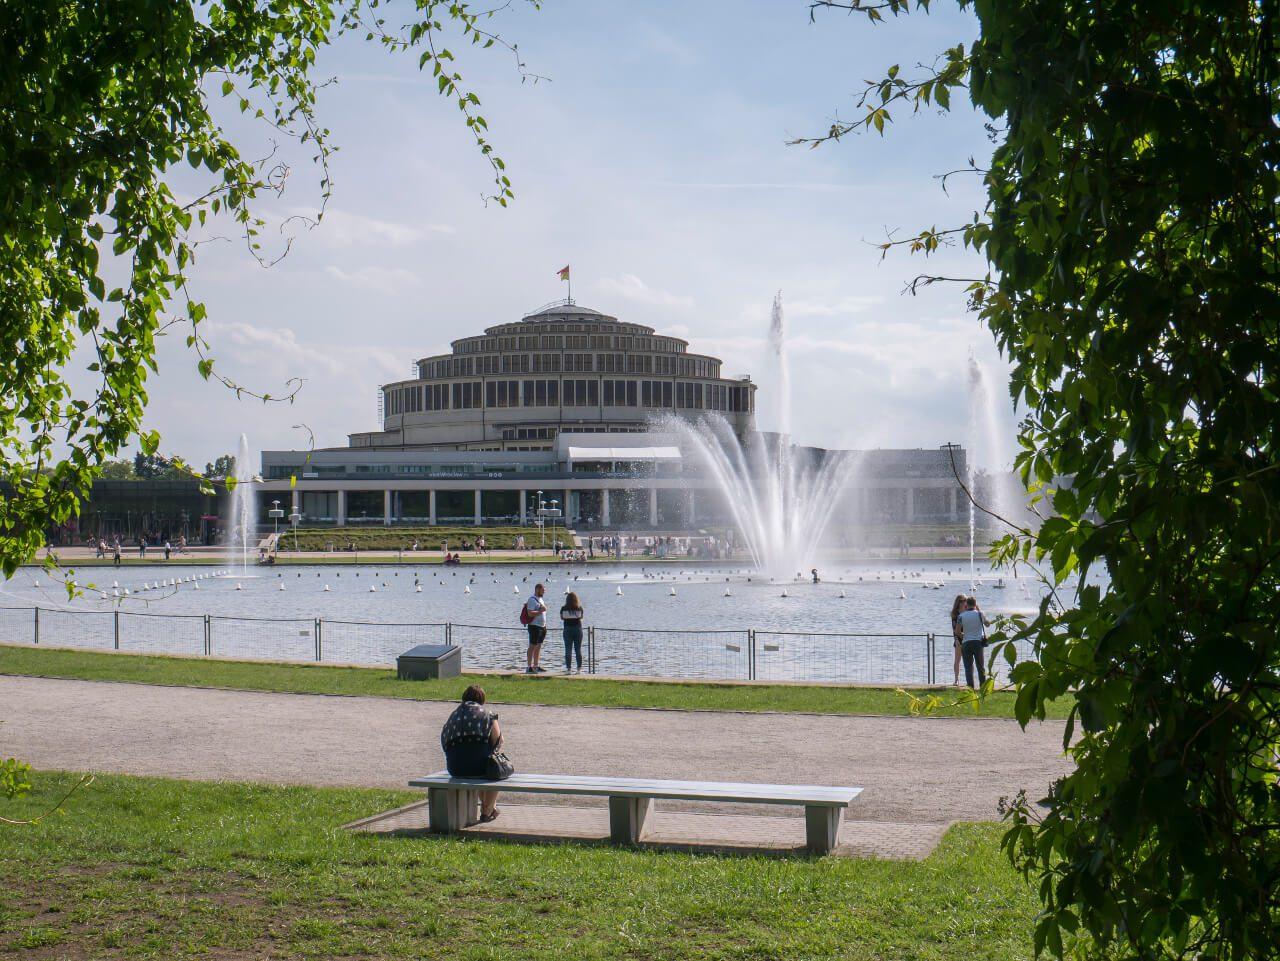 Hala Stulecia, fontanna multimedialna i pergola we Wrocławiu